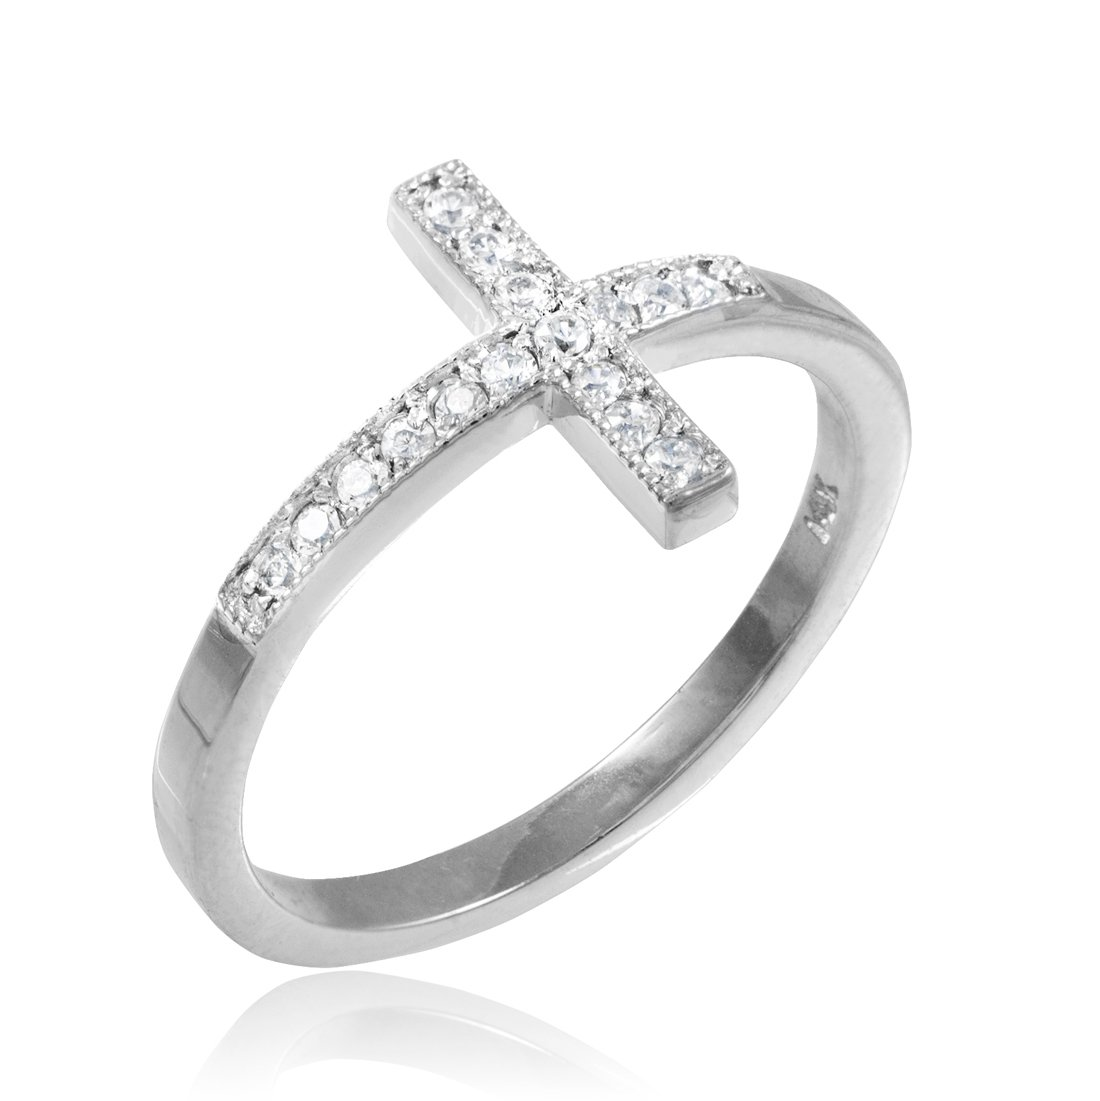 14k White Gold Sideways Cross Ring with Diamonds (5)